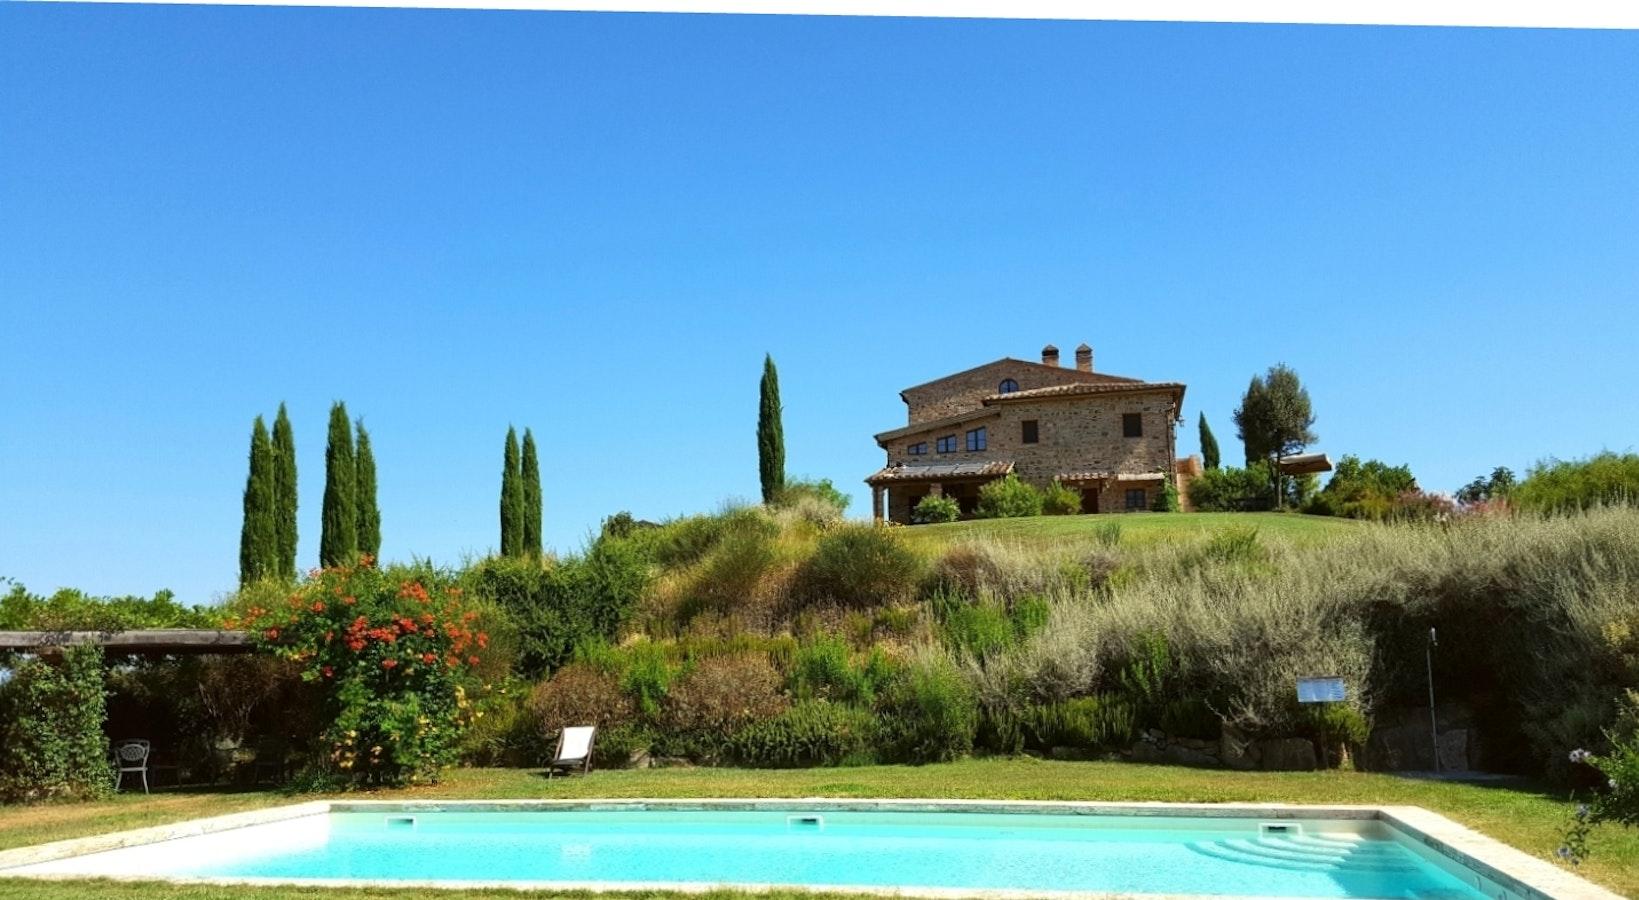 Podere cunina agriturismo buonconvento vicino siena - Agriturismo siena con piscina ...